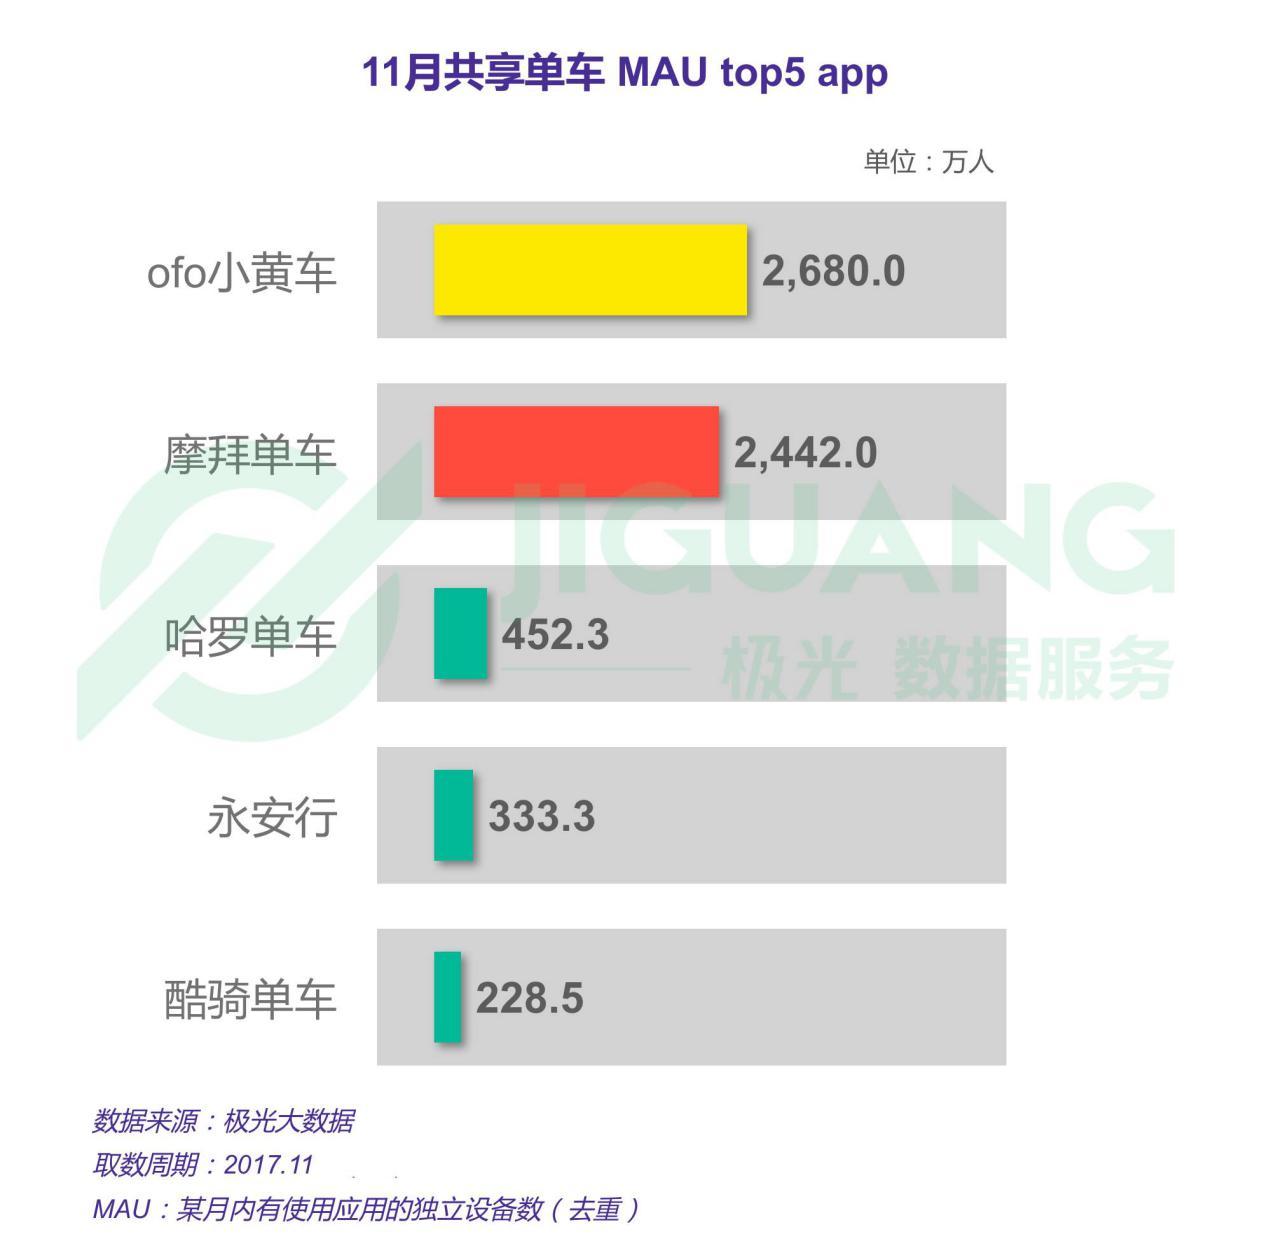 C:\Users\ADMINI~1\AppData\Local\Temp\WeChat Files\a6830ef2c4b655de6eb340800d77cc71.jpg